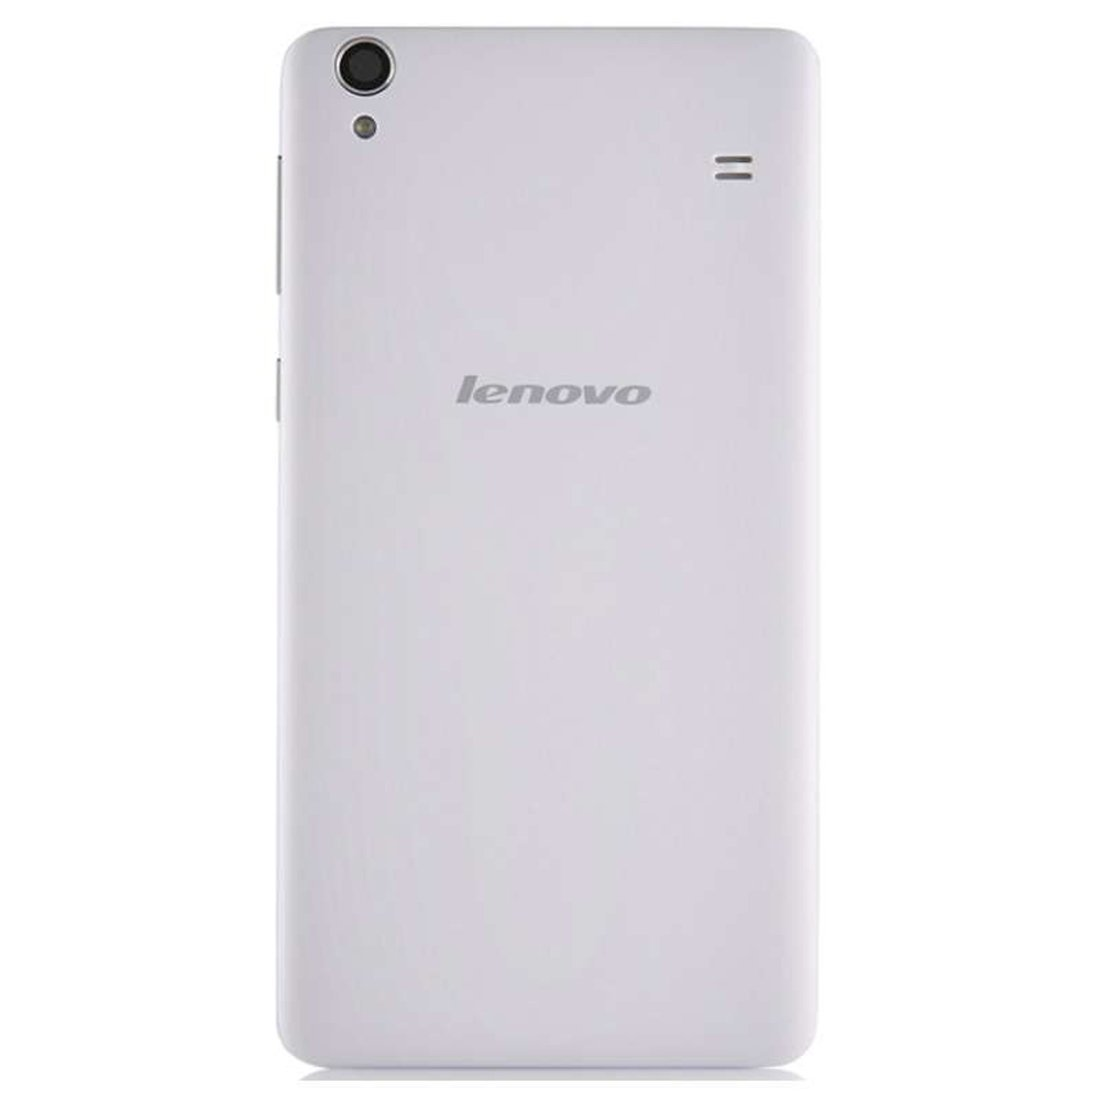 Lenovo Octa core phone